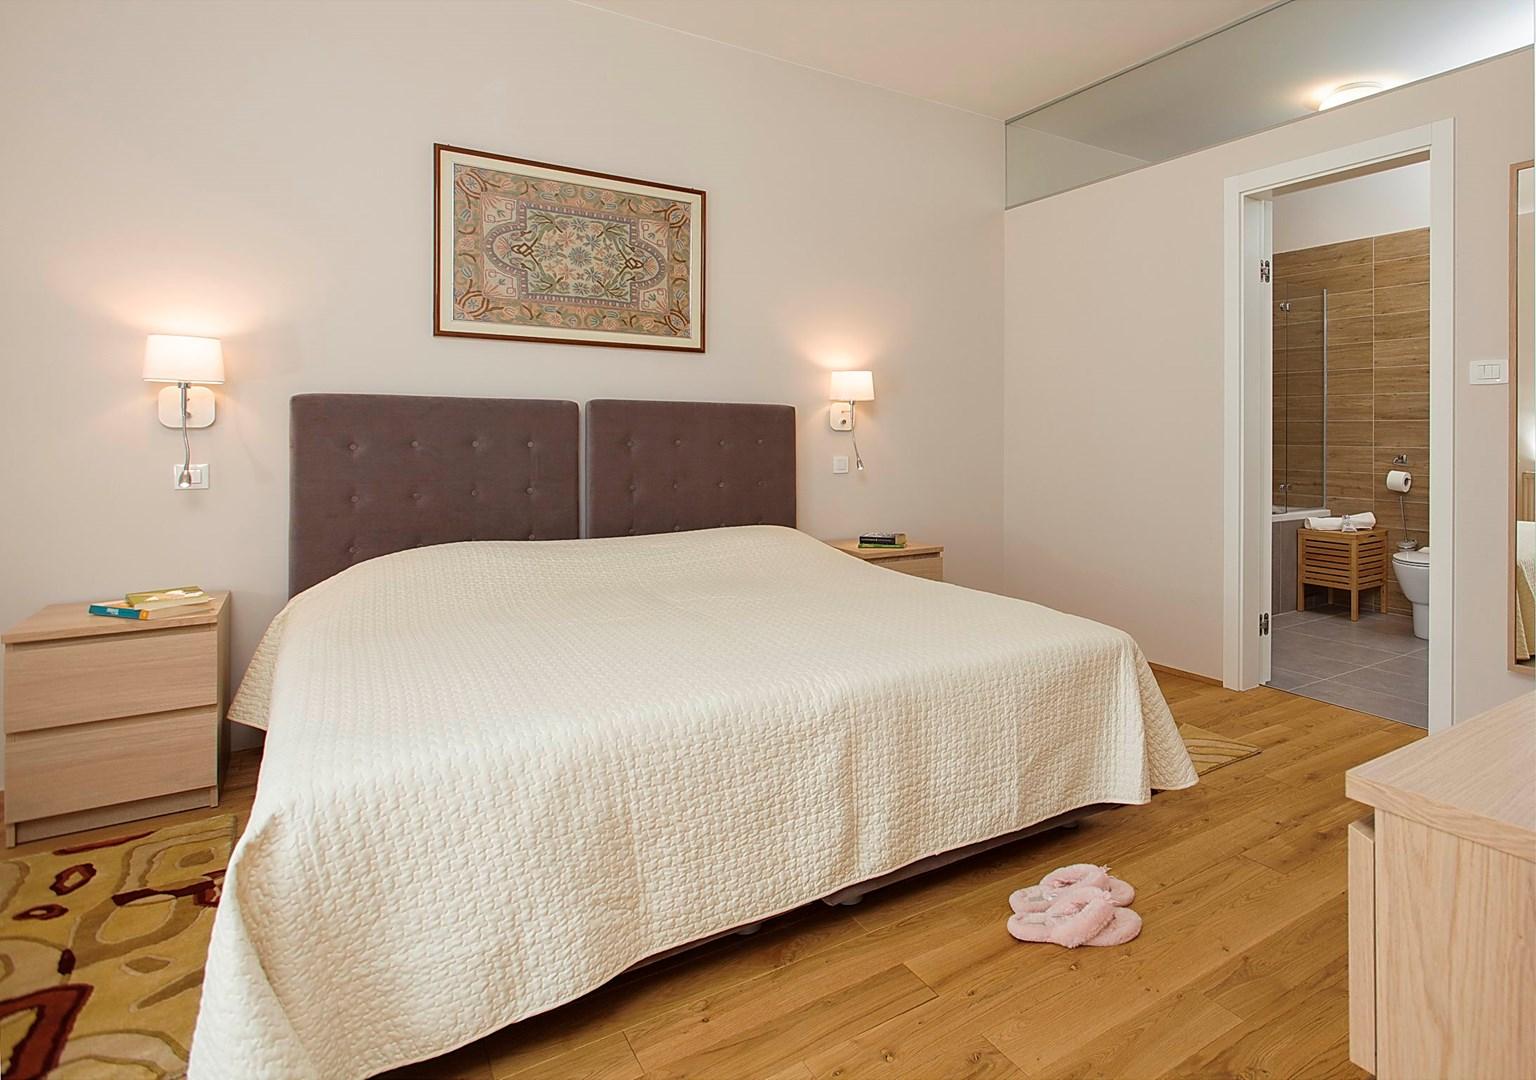 Ferienhaus  (2474393), Kostanje, , Dalmatien, Kroatien, Bild 25